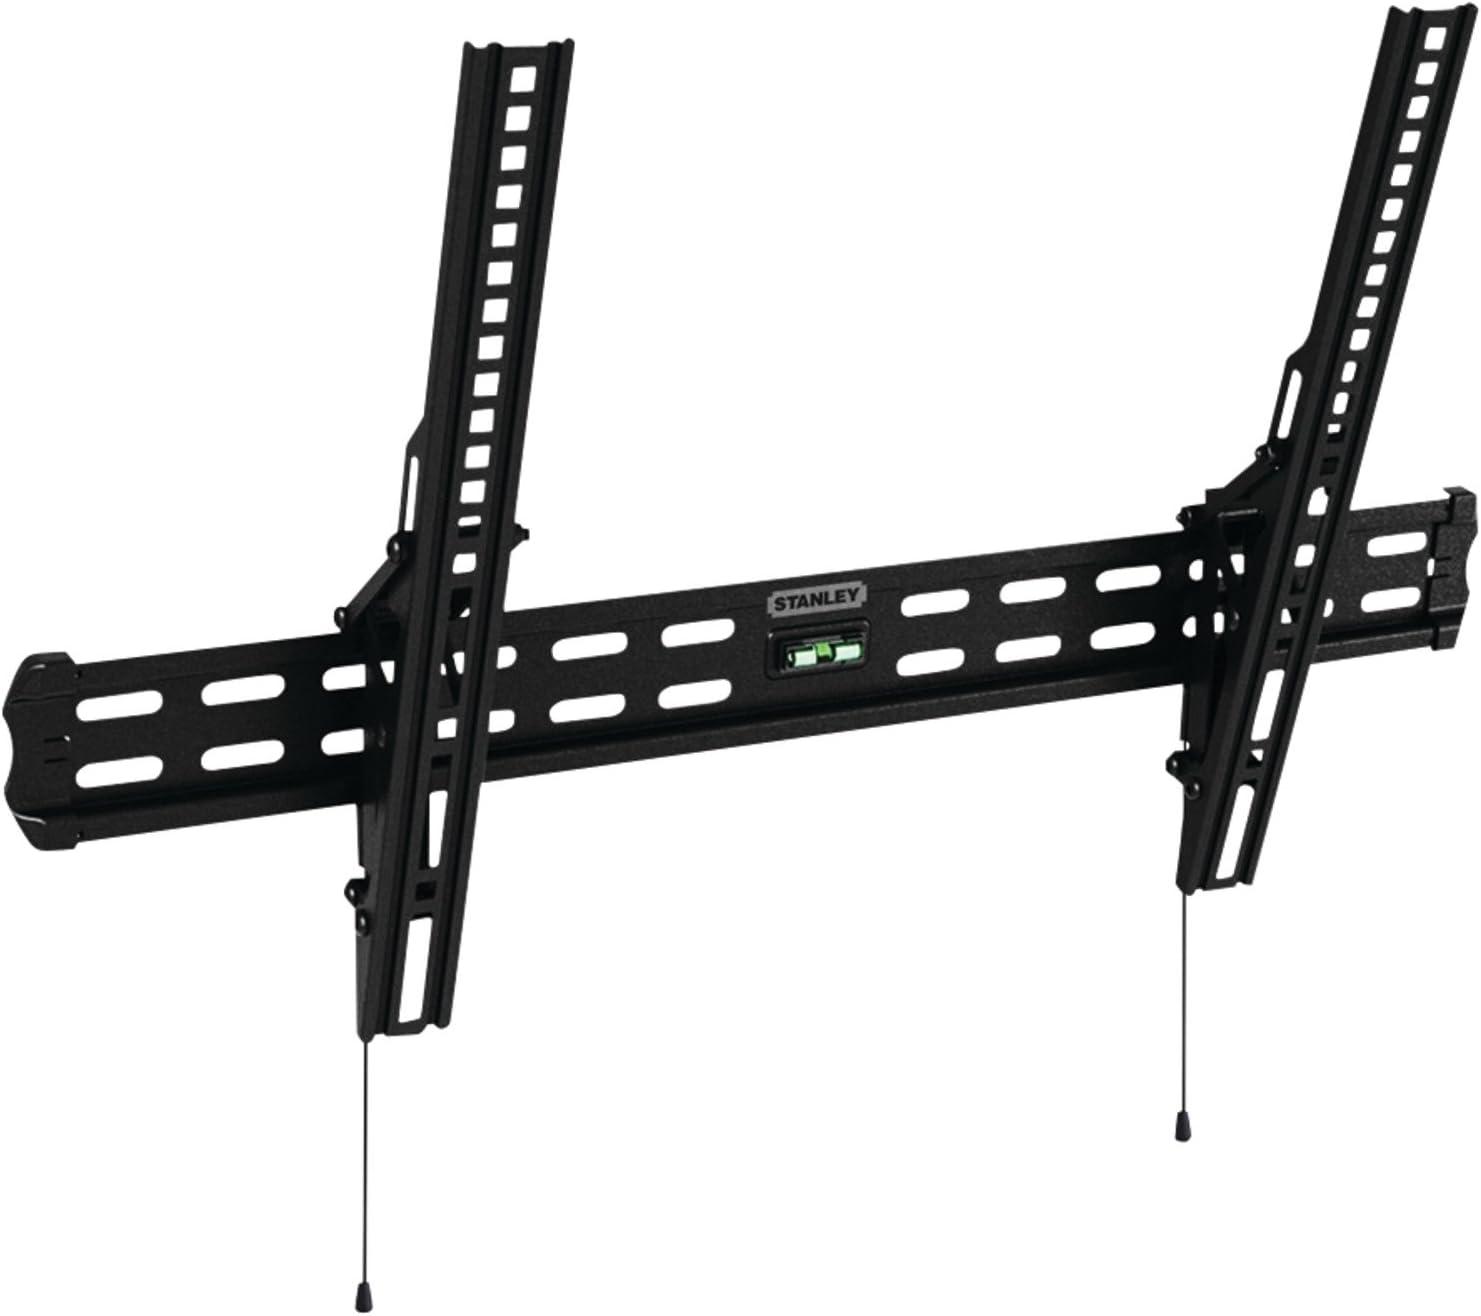 Stanley TV Wall Mount - Slim Design Tilt Mount for Medium Flat Panel Television (TMR-105T)